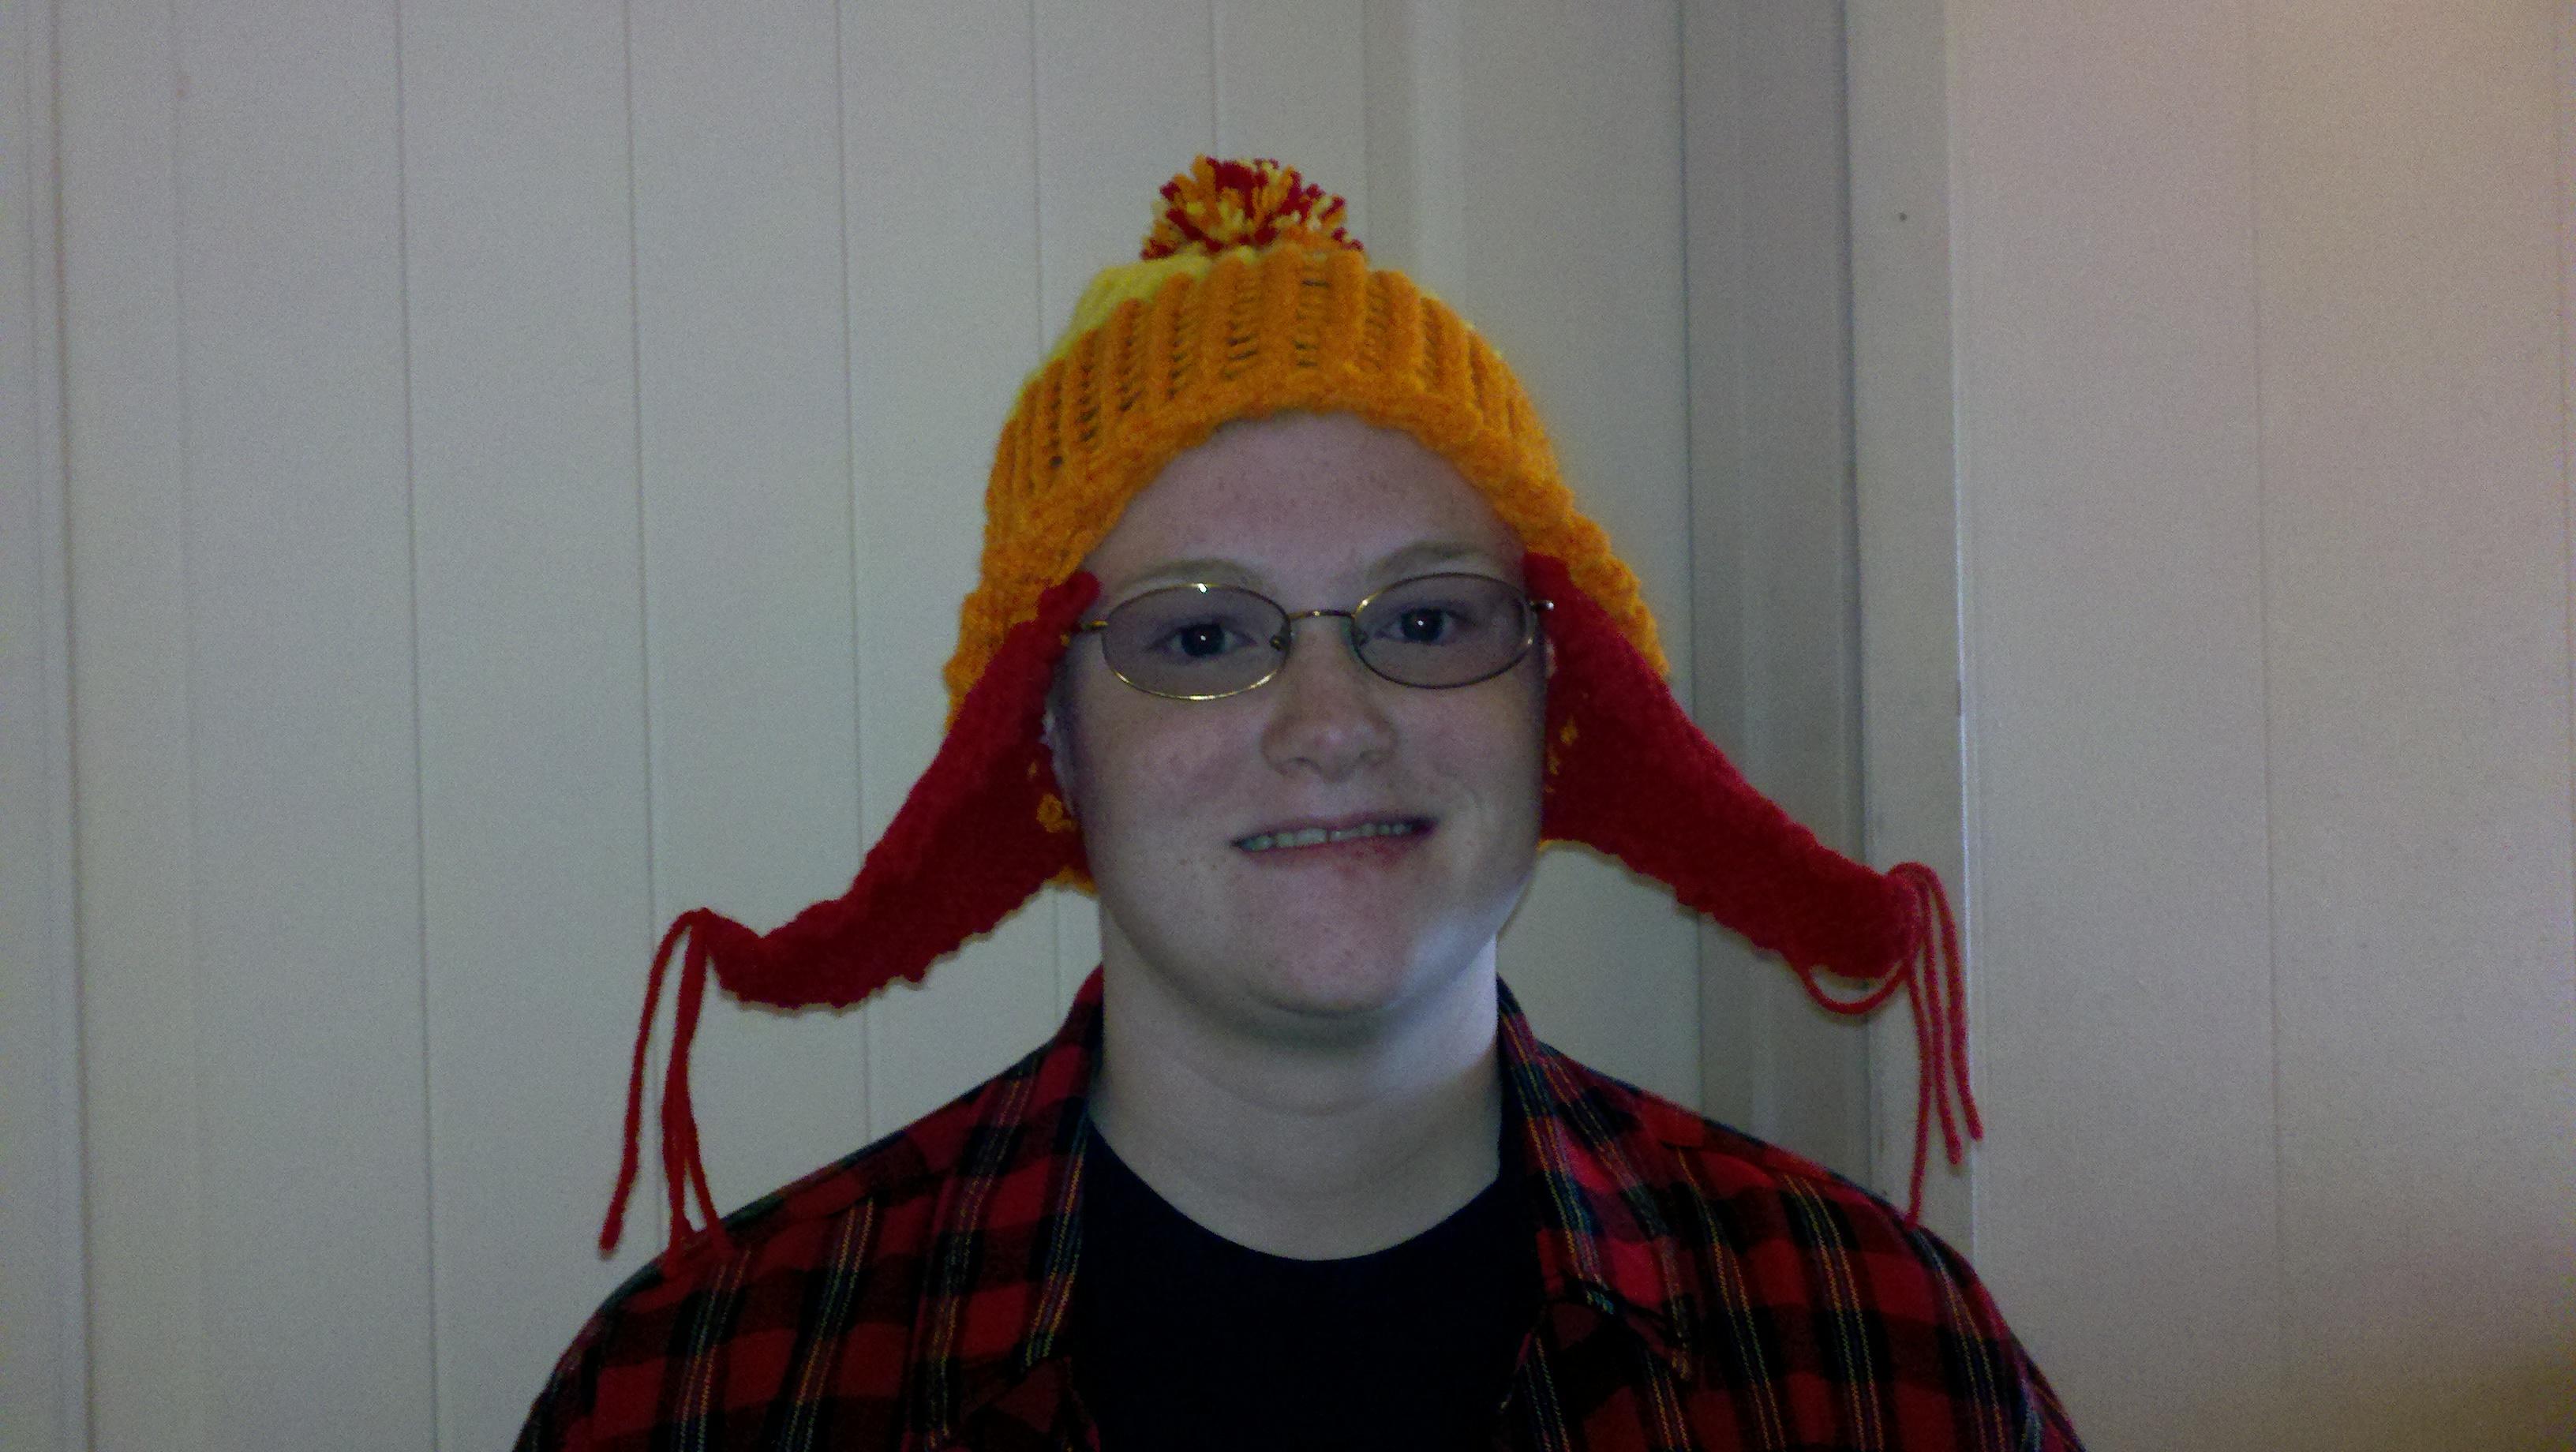 Jayne Hat on a Round Knitting Loom